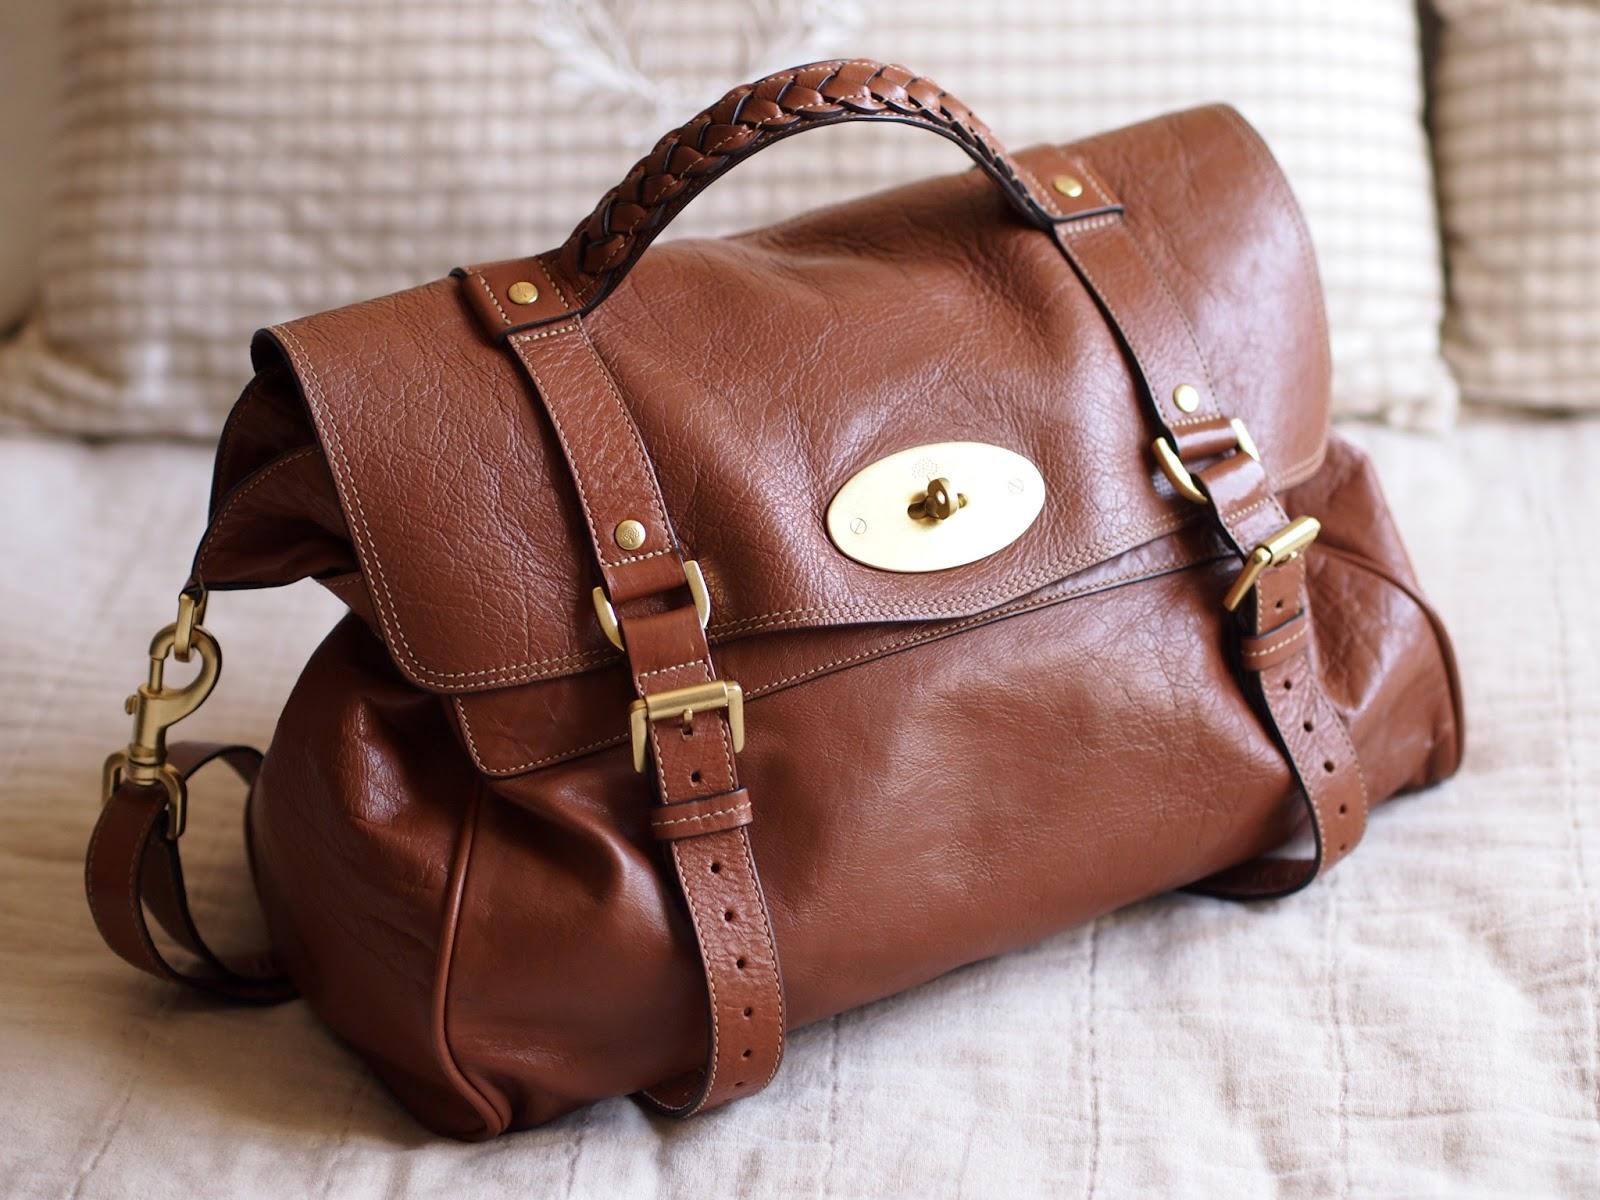 Mulberry laukku hinta